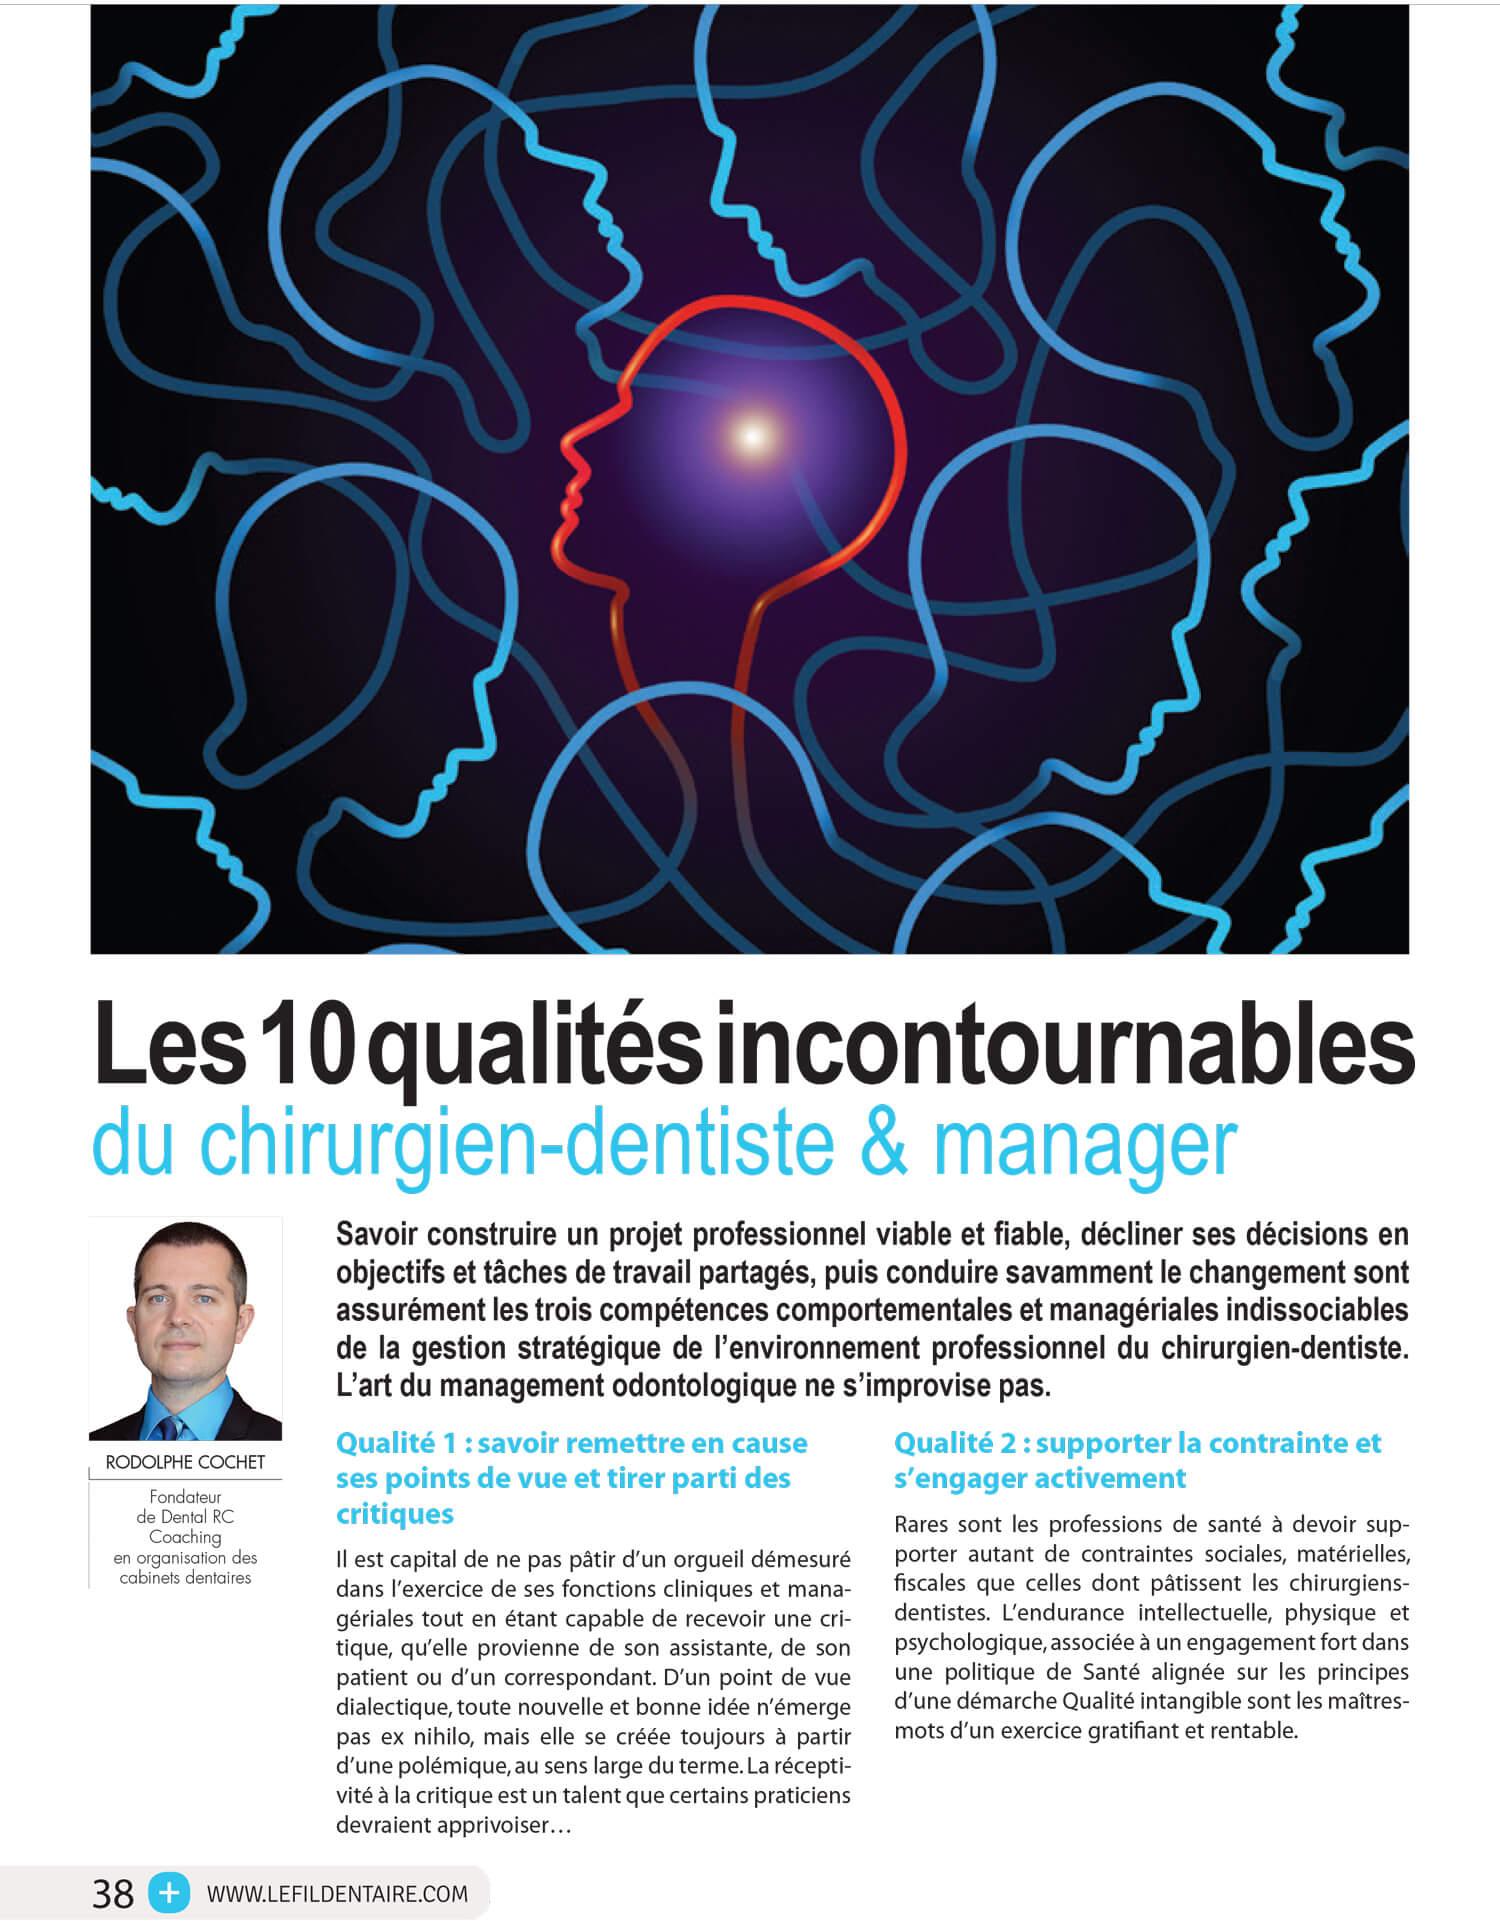 10-qualites-incontournables-dentiste-manager-rodolphe-cochet-coach.jpg